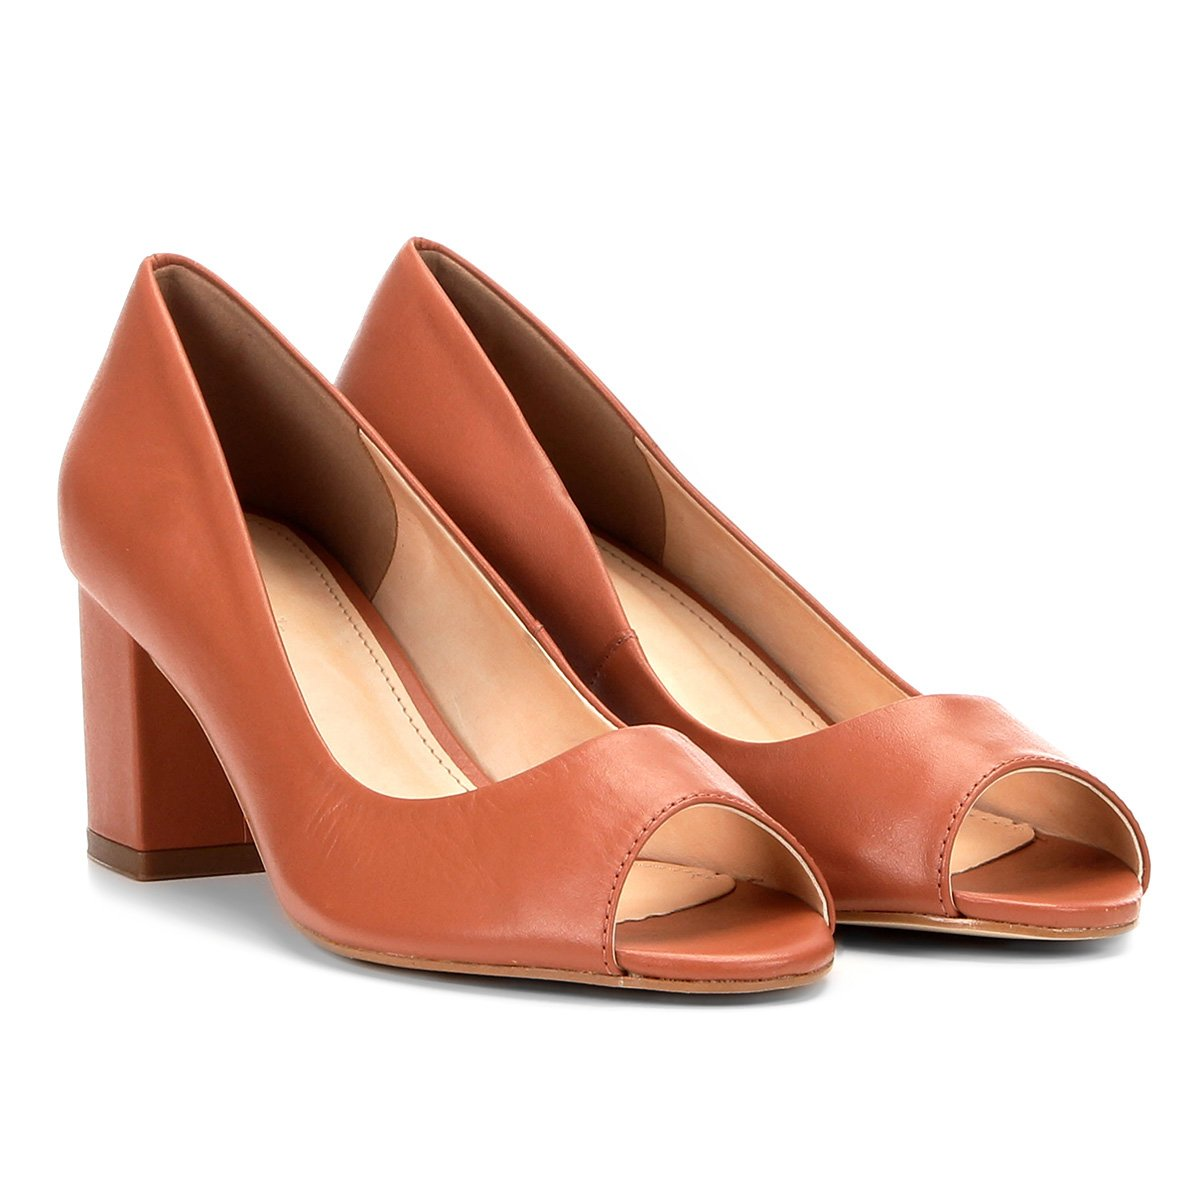 Toe Peep Peep Salto Shoestock Toe Grosso Couro Couro Marrom gTxwgOp